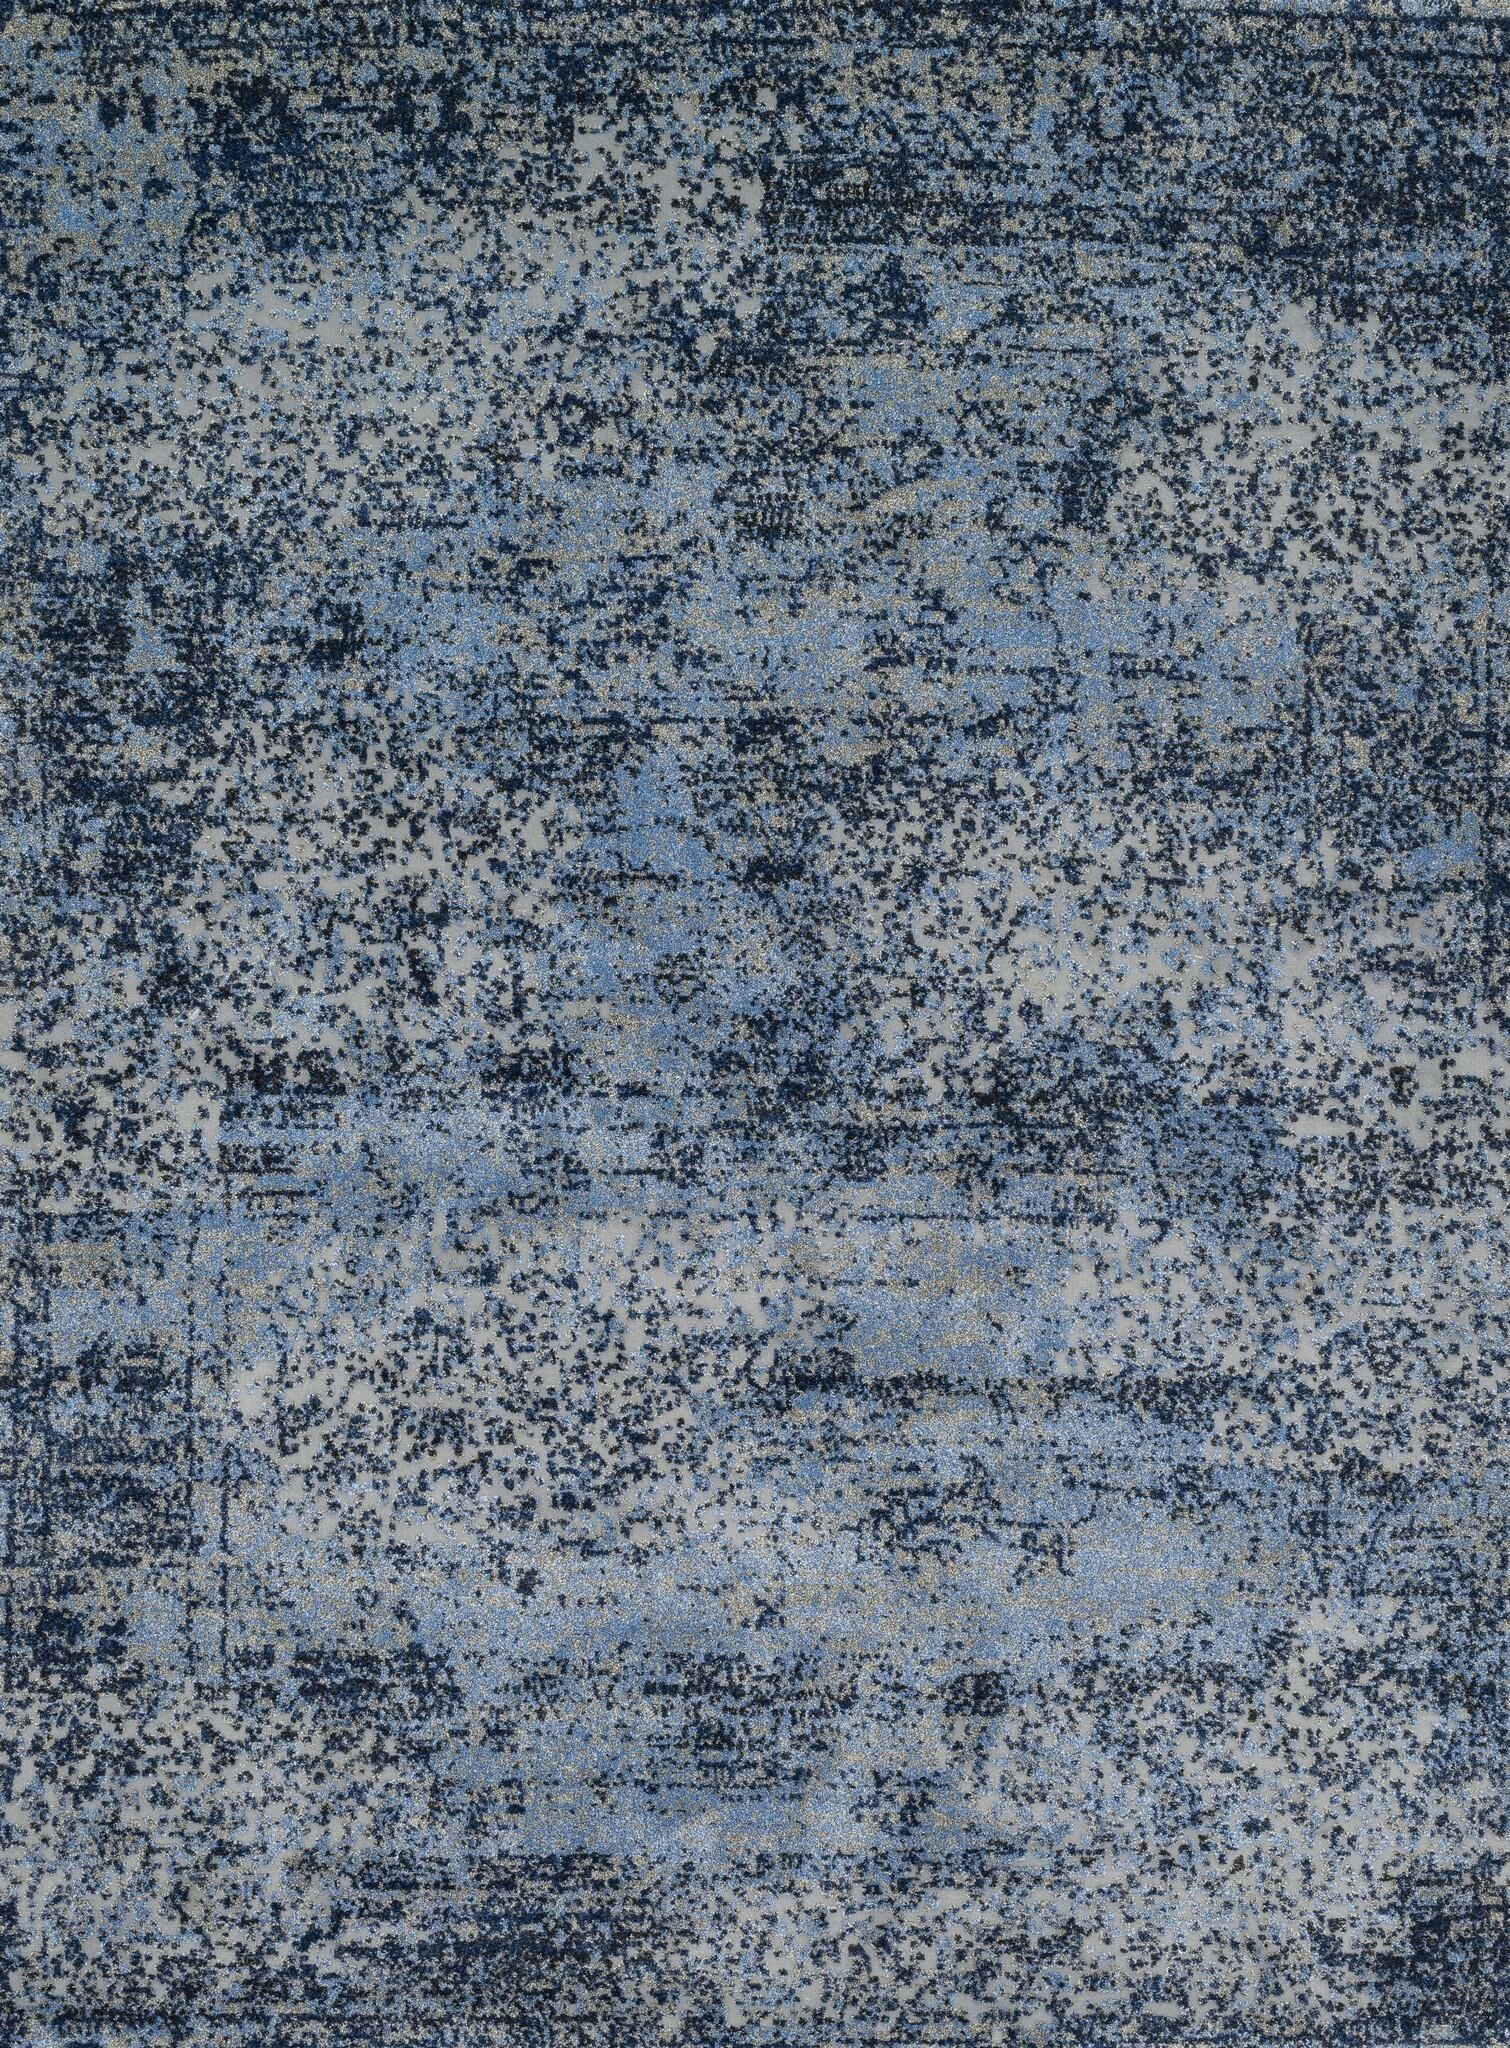 Aurora Light Blue/Gray Area Rug Rug Size: Square 1'6